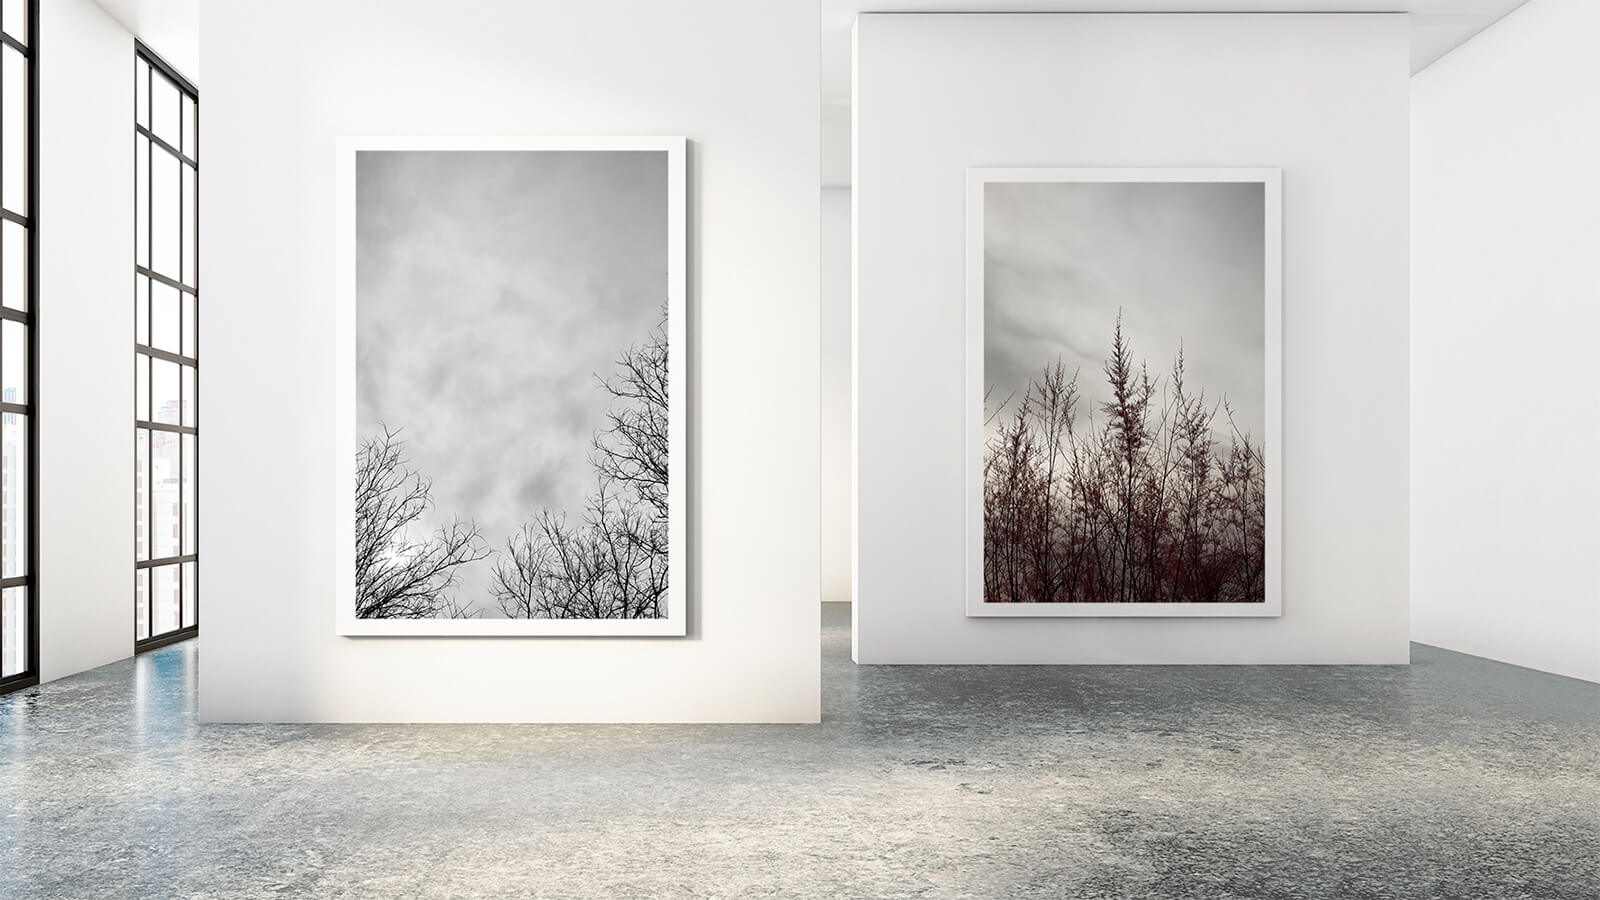 TAIYOKO-STUDIO-exposicion-Horno-Virtual-Gallery-sunset-sunrise-galeria-arte-fotografia-artistica-edicion-limitada-decoracion